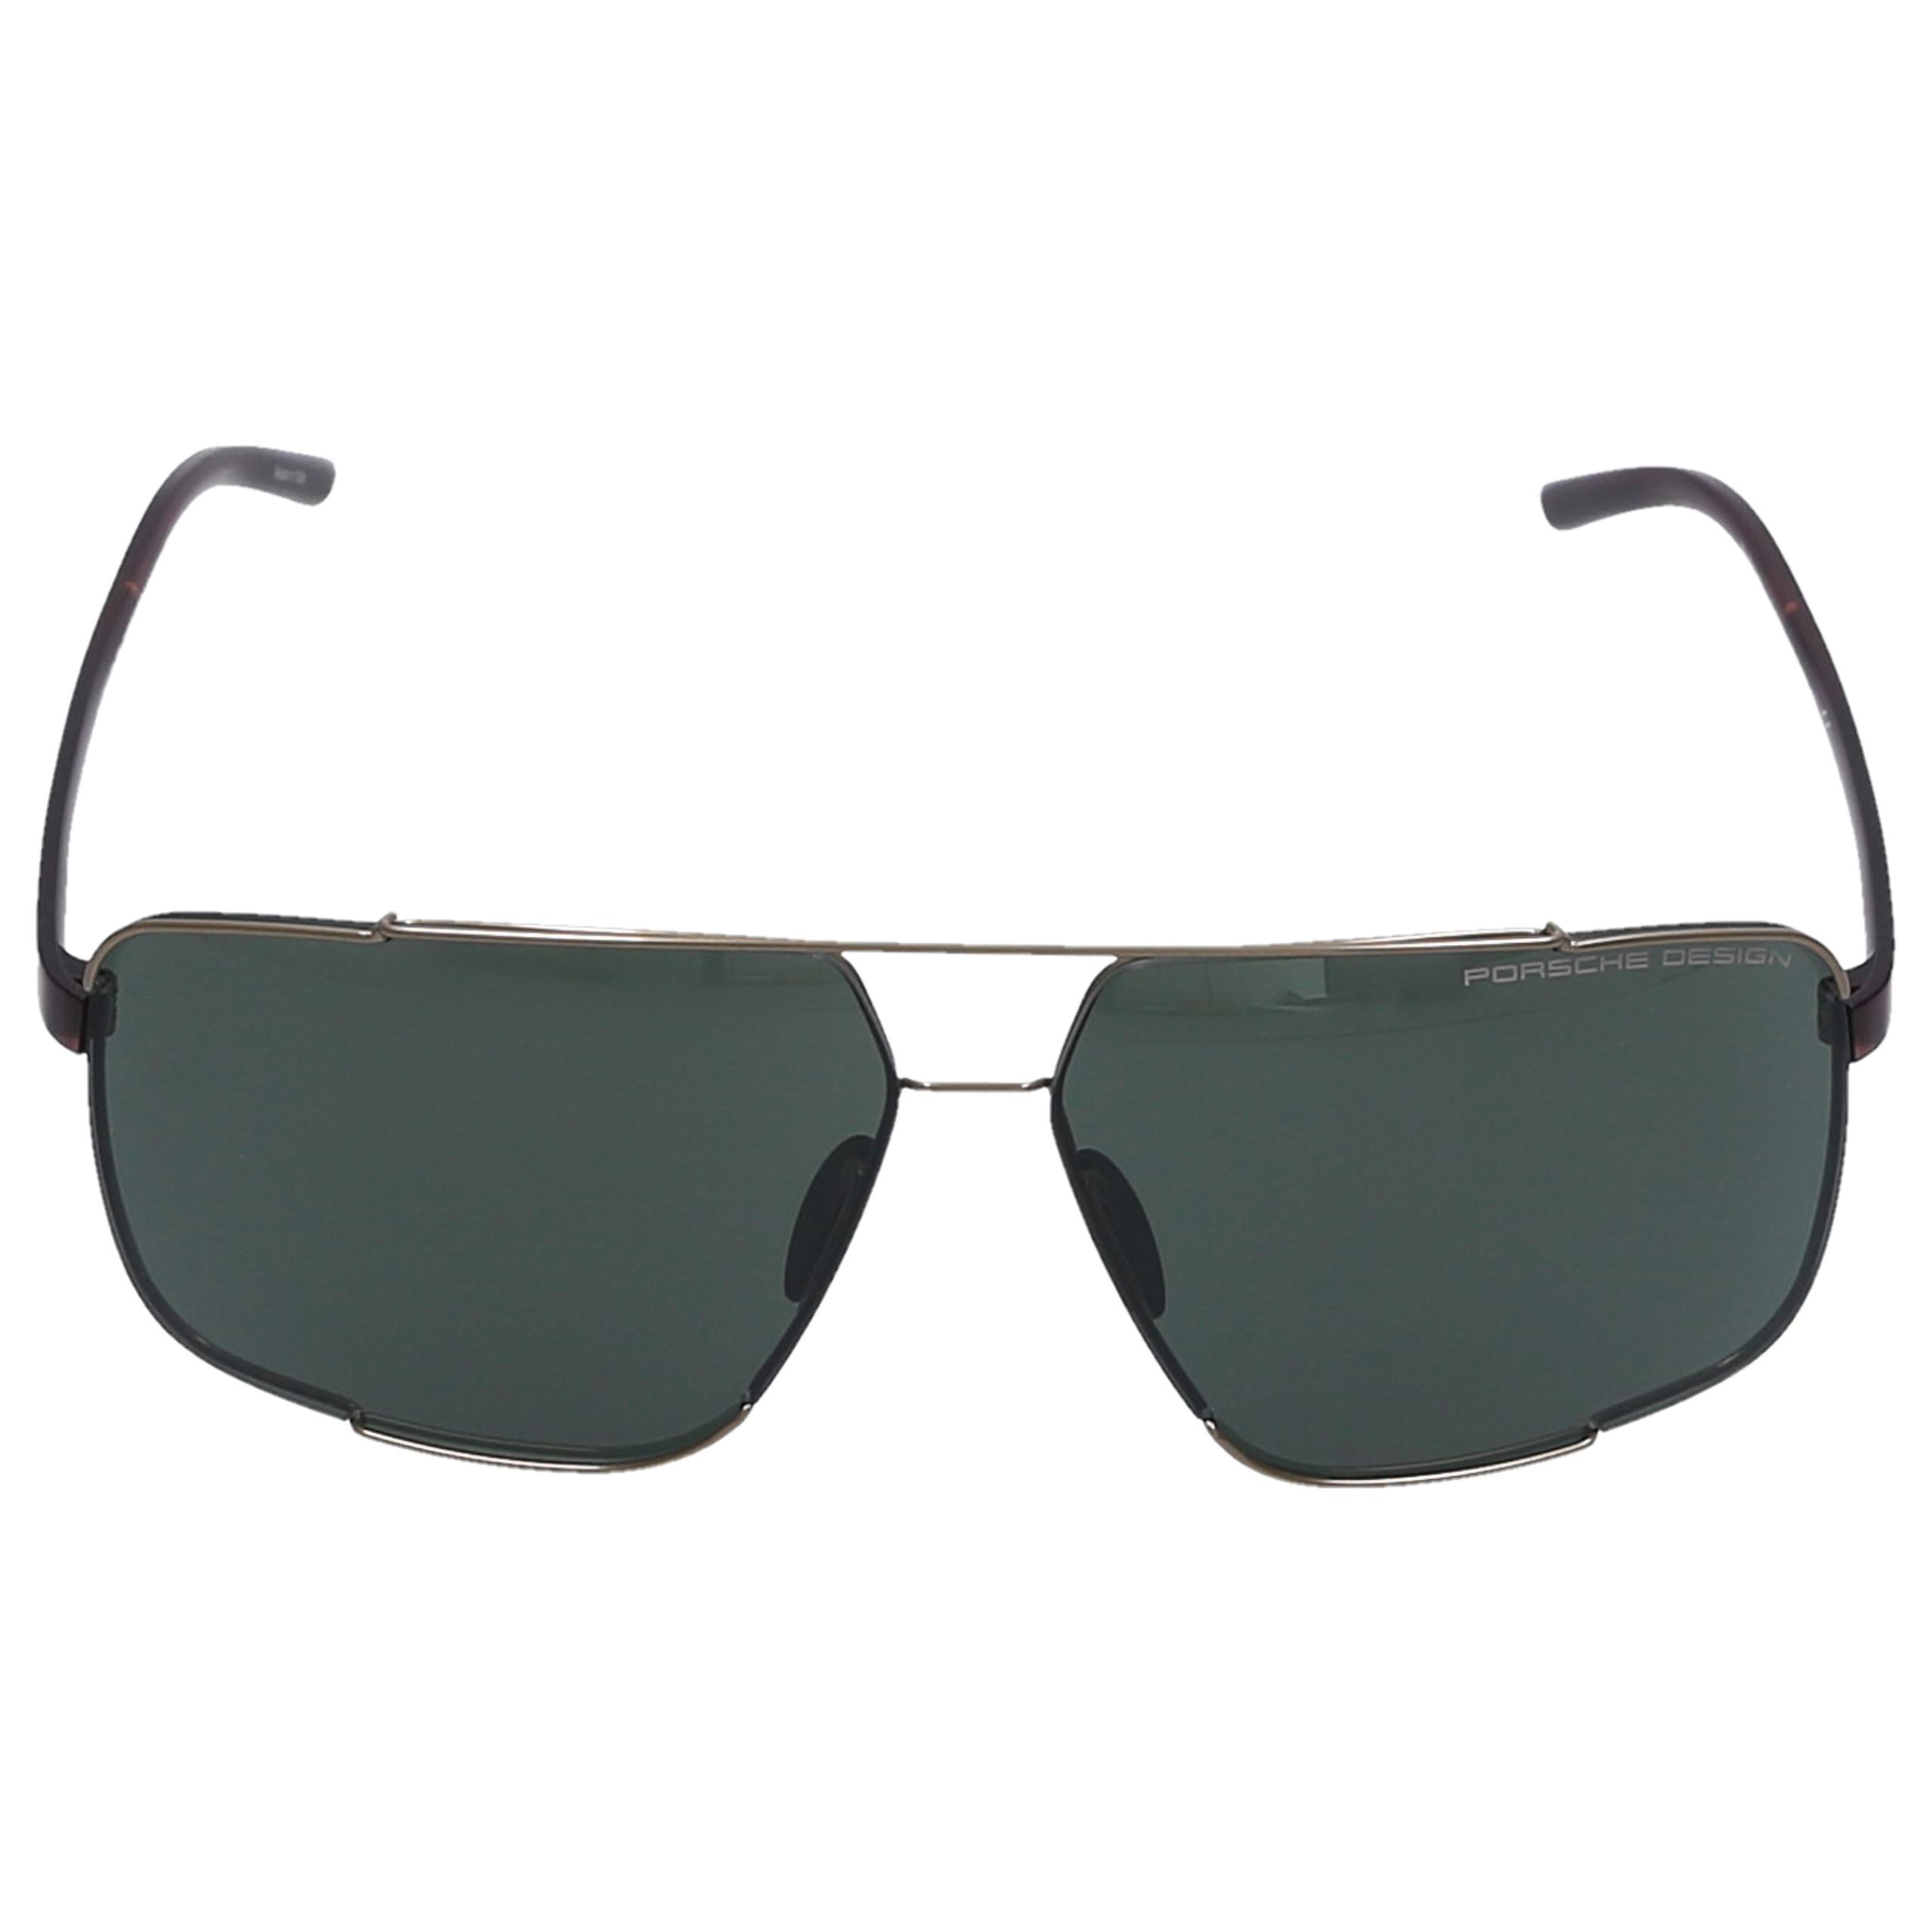 Sonnenbrille Square P8681 B 66/12 Acetat braun